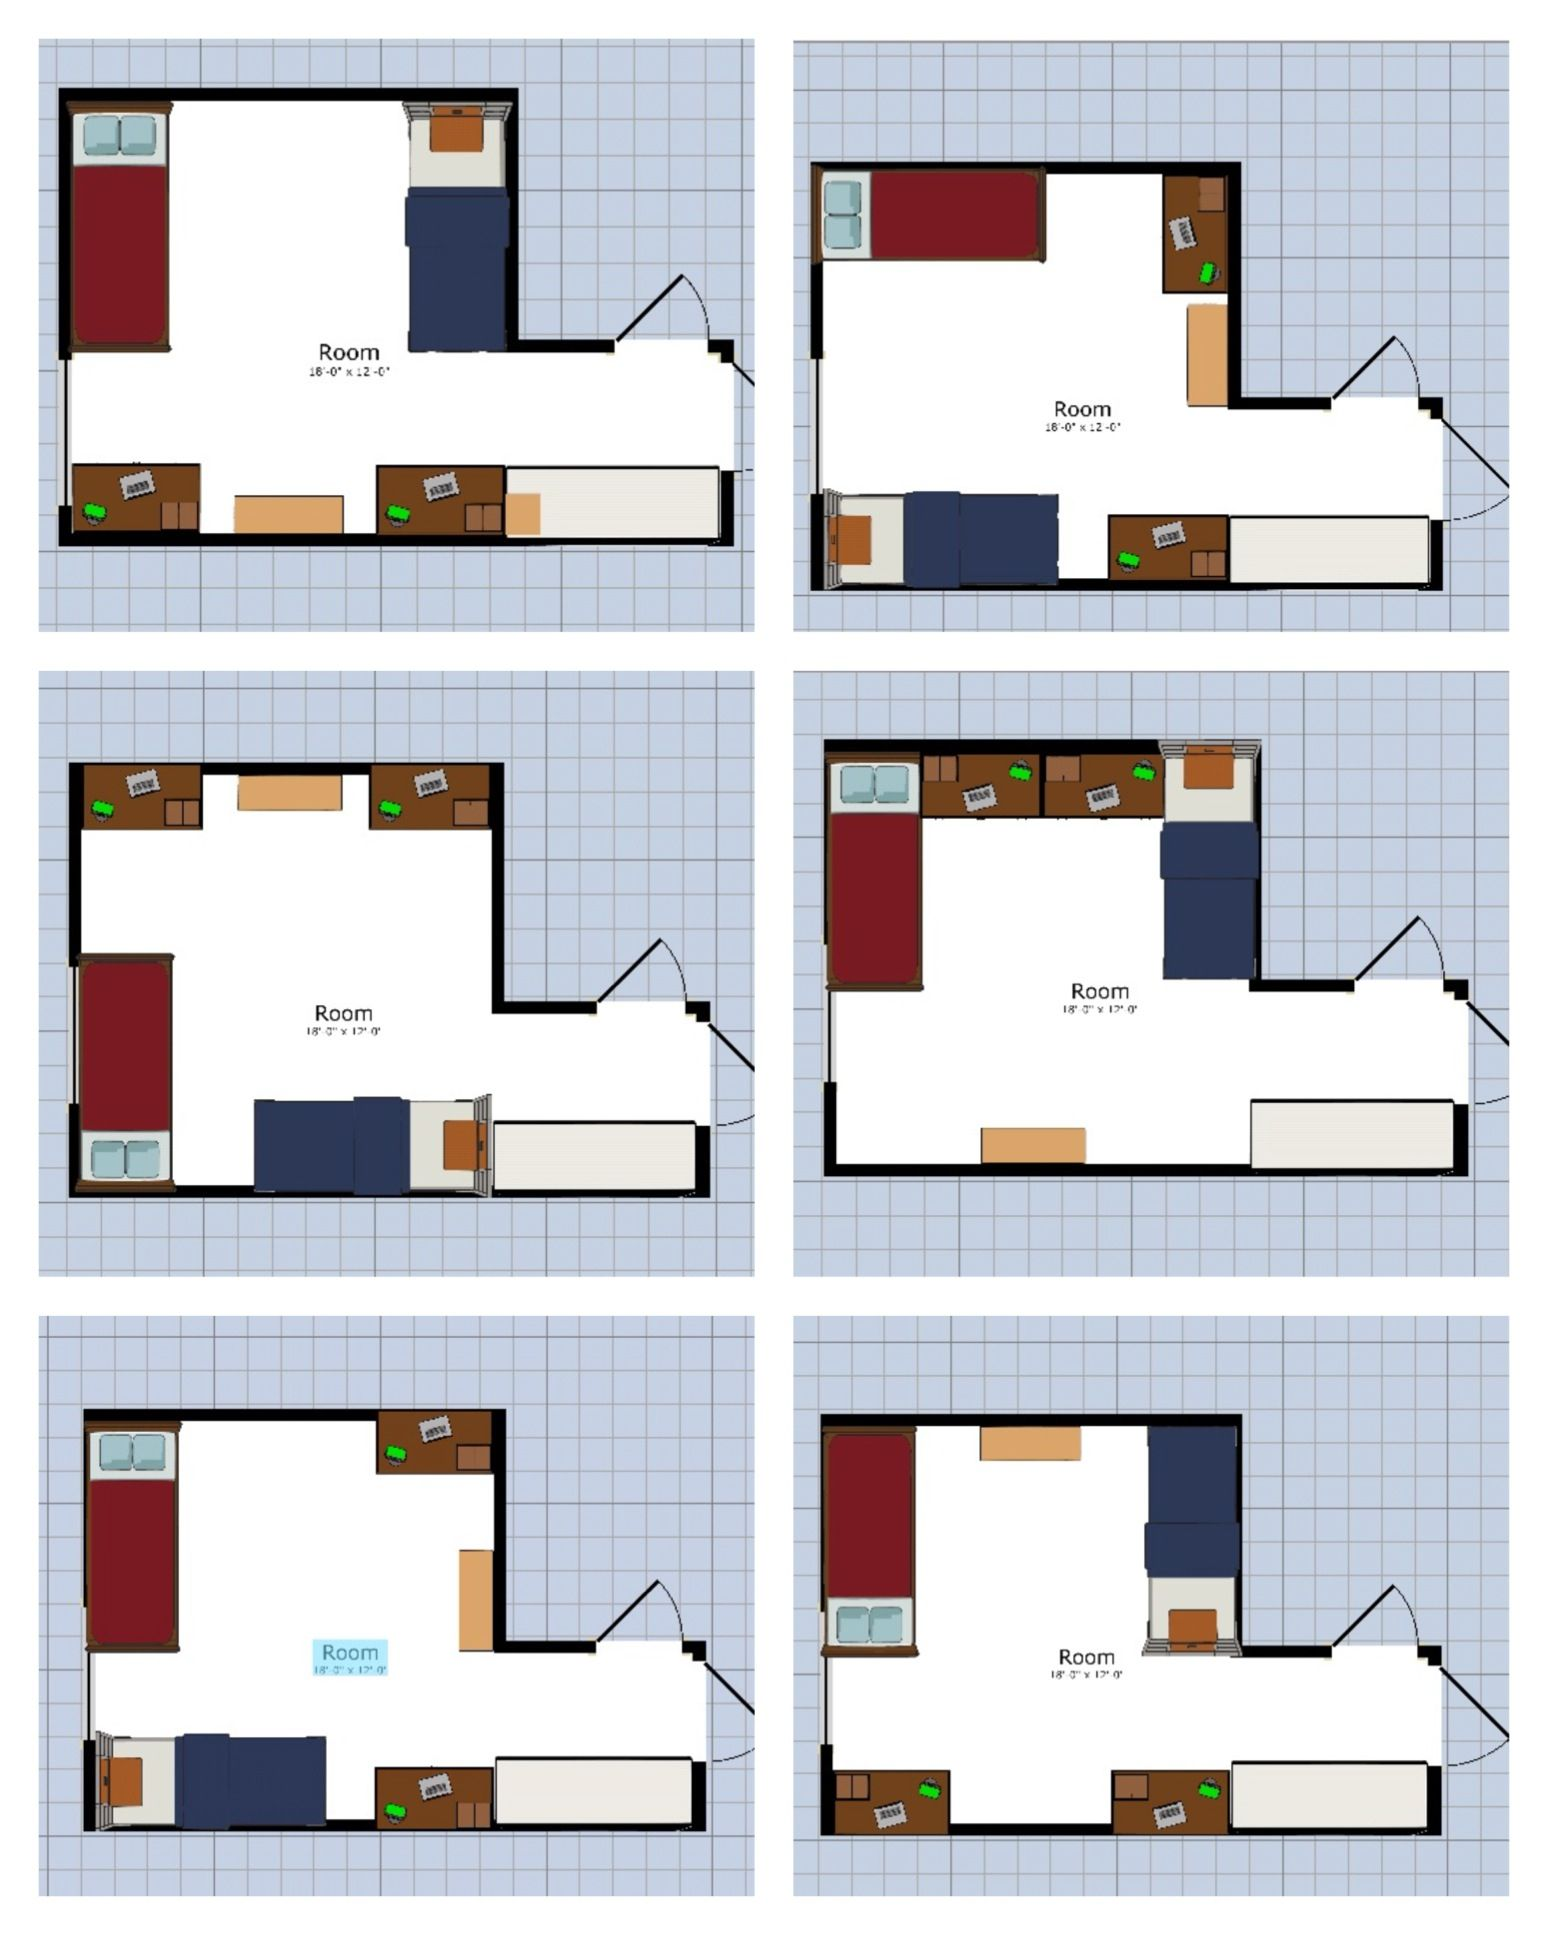 Nmu Dorm Layout Ideas I Personally Like 1 2 And 5